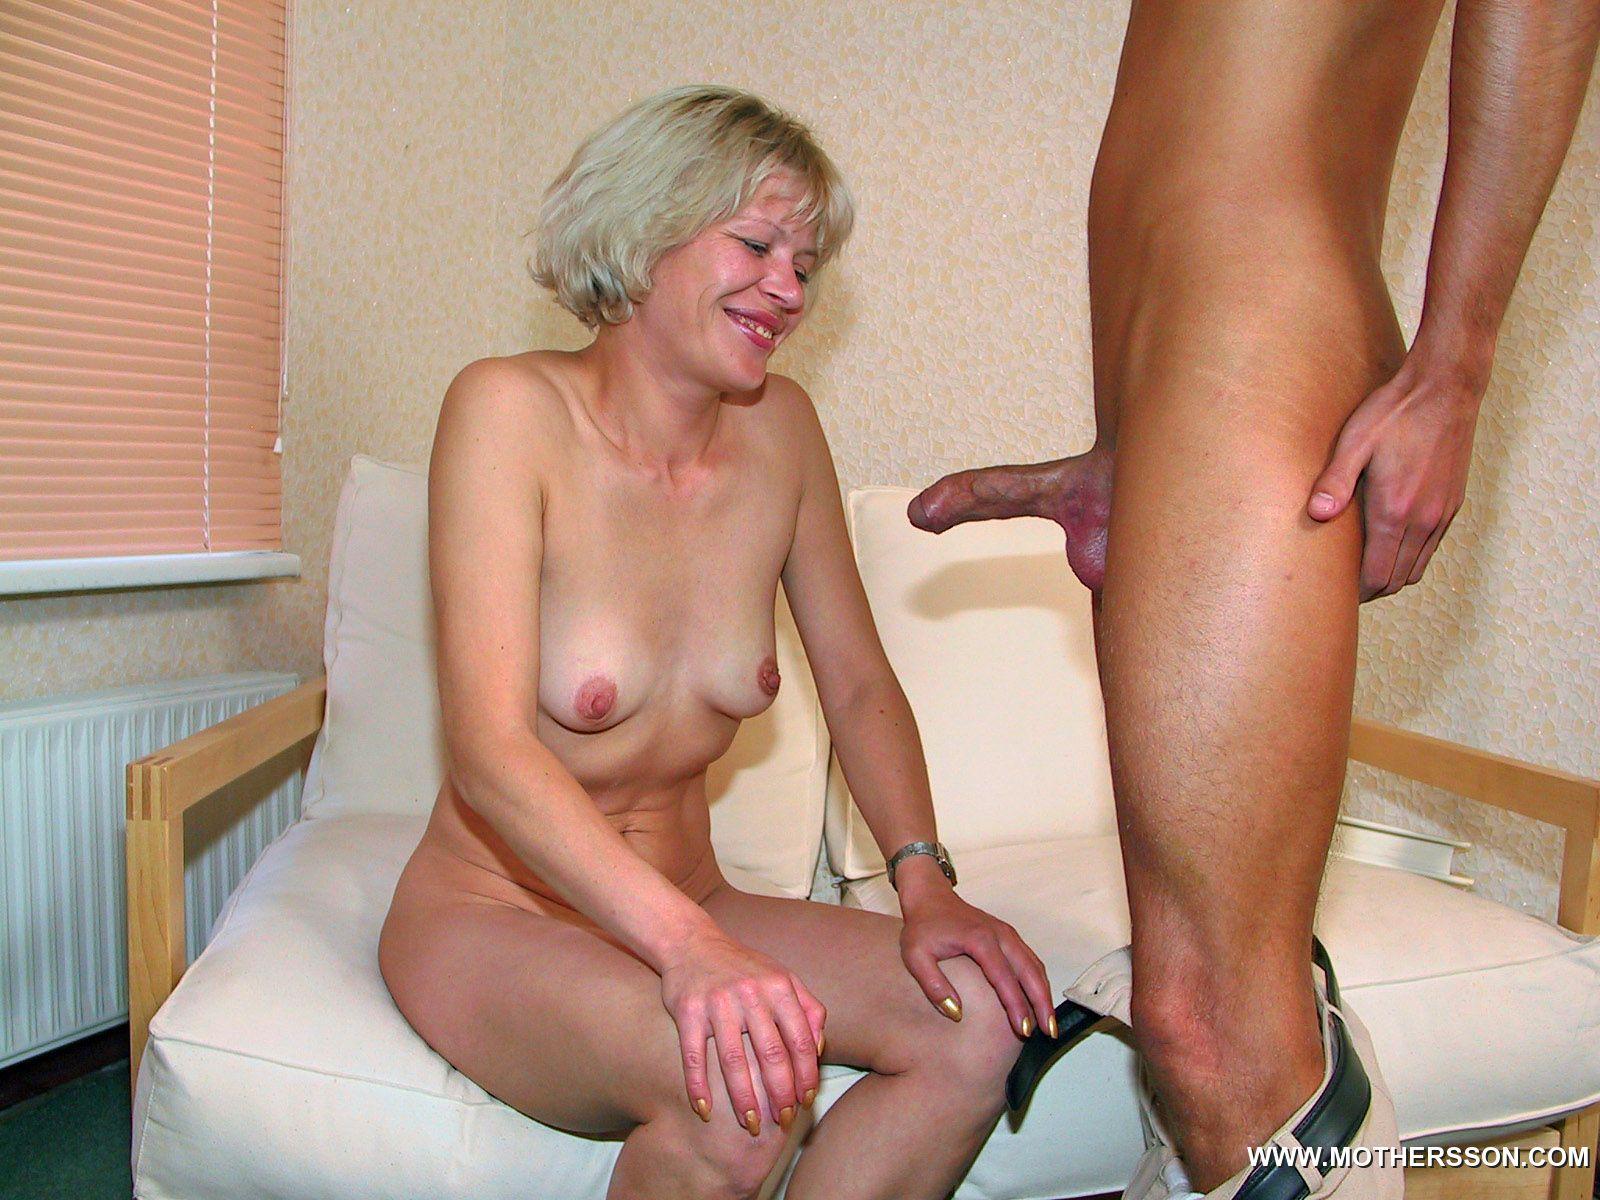 Mom pornhere son, crippled black midget